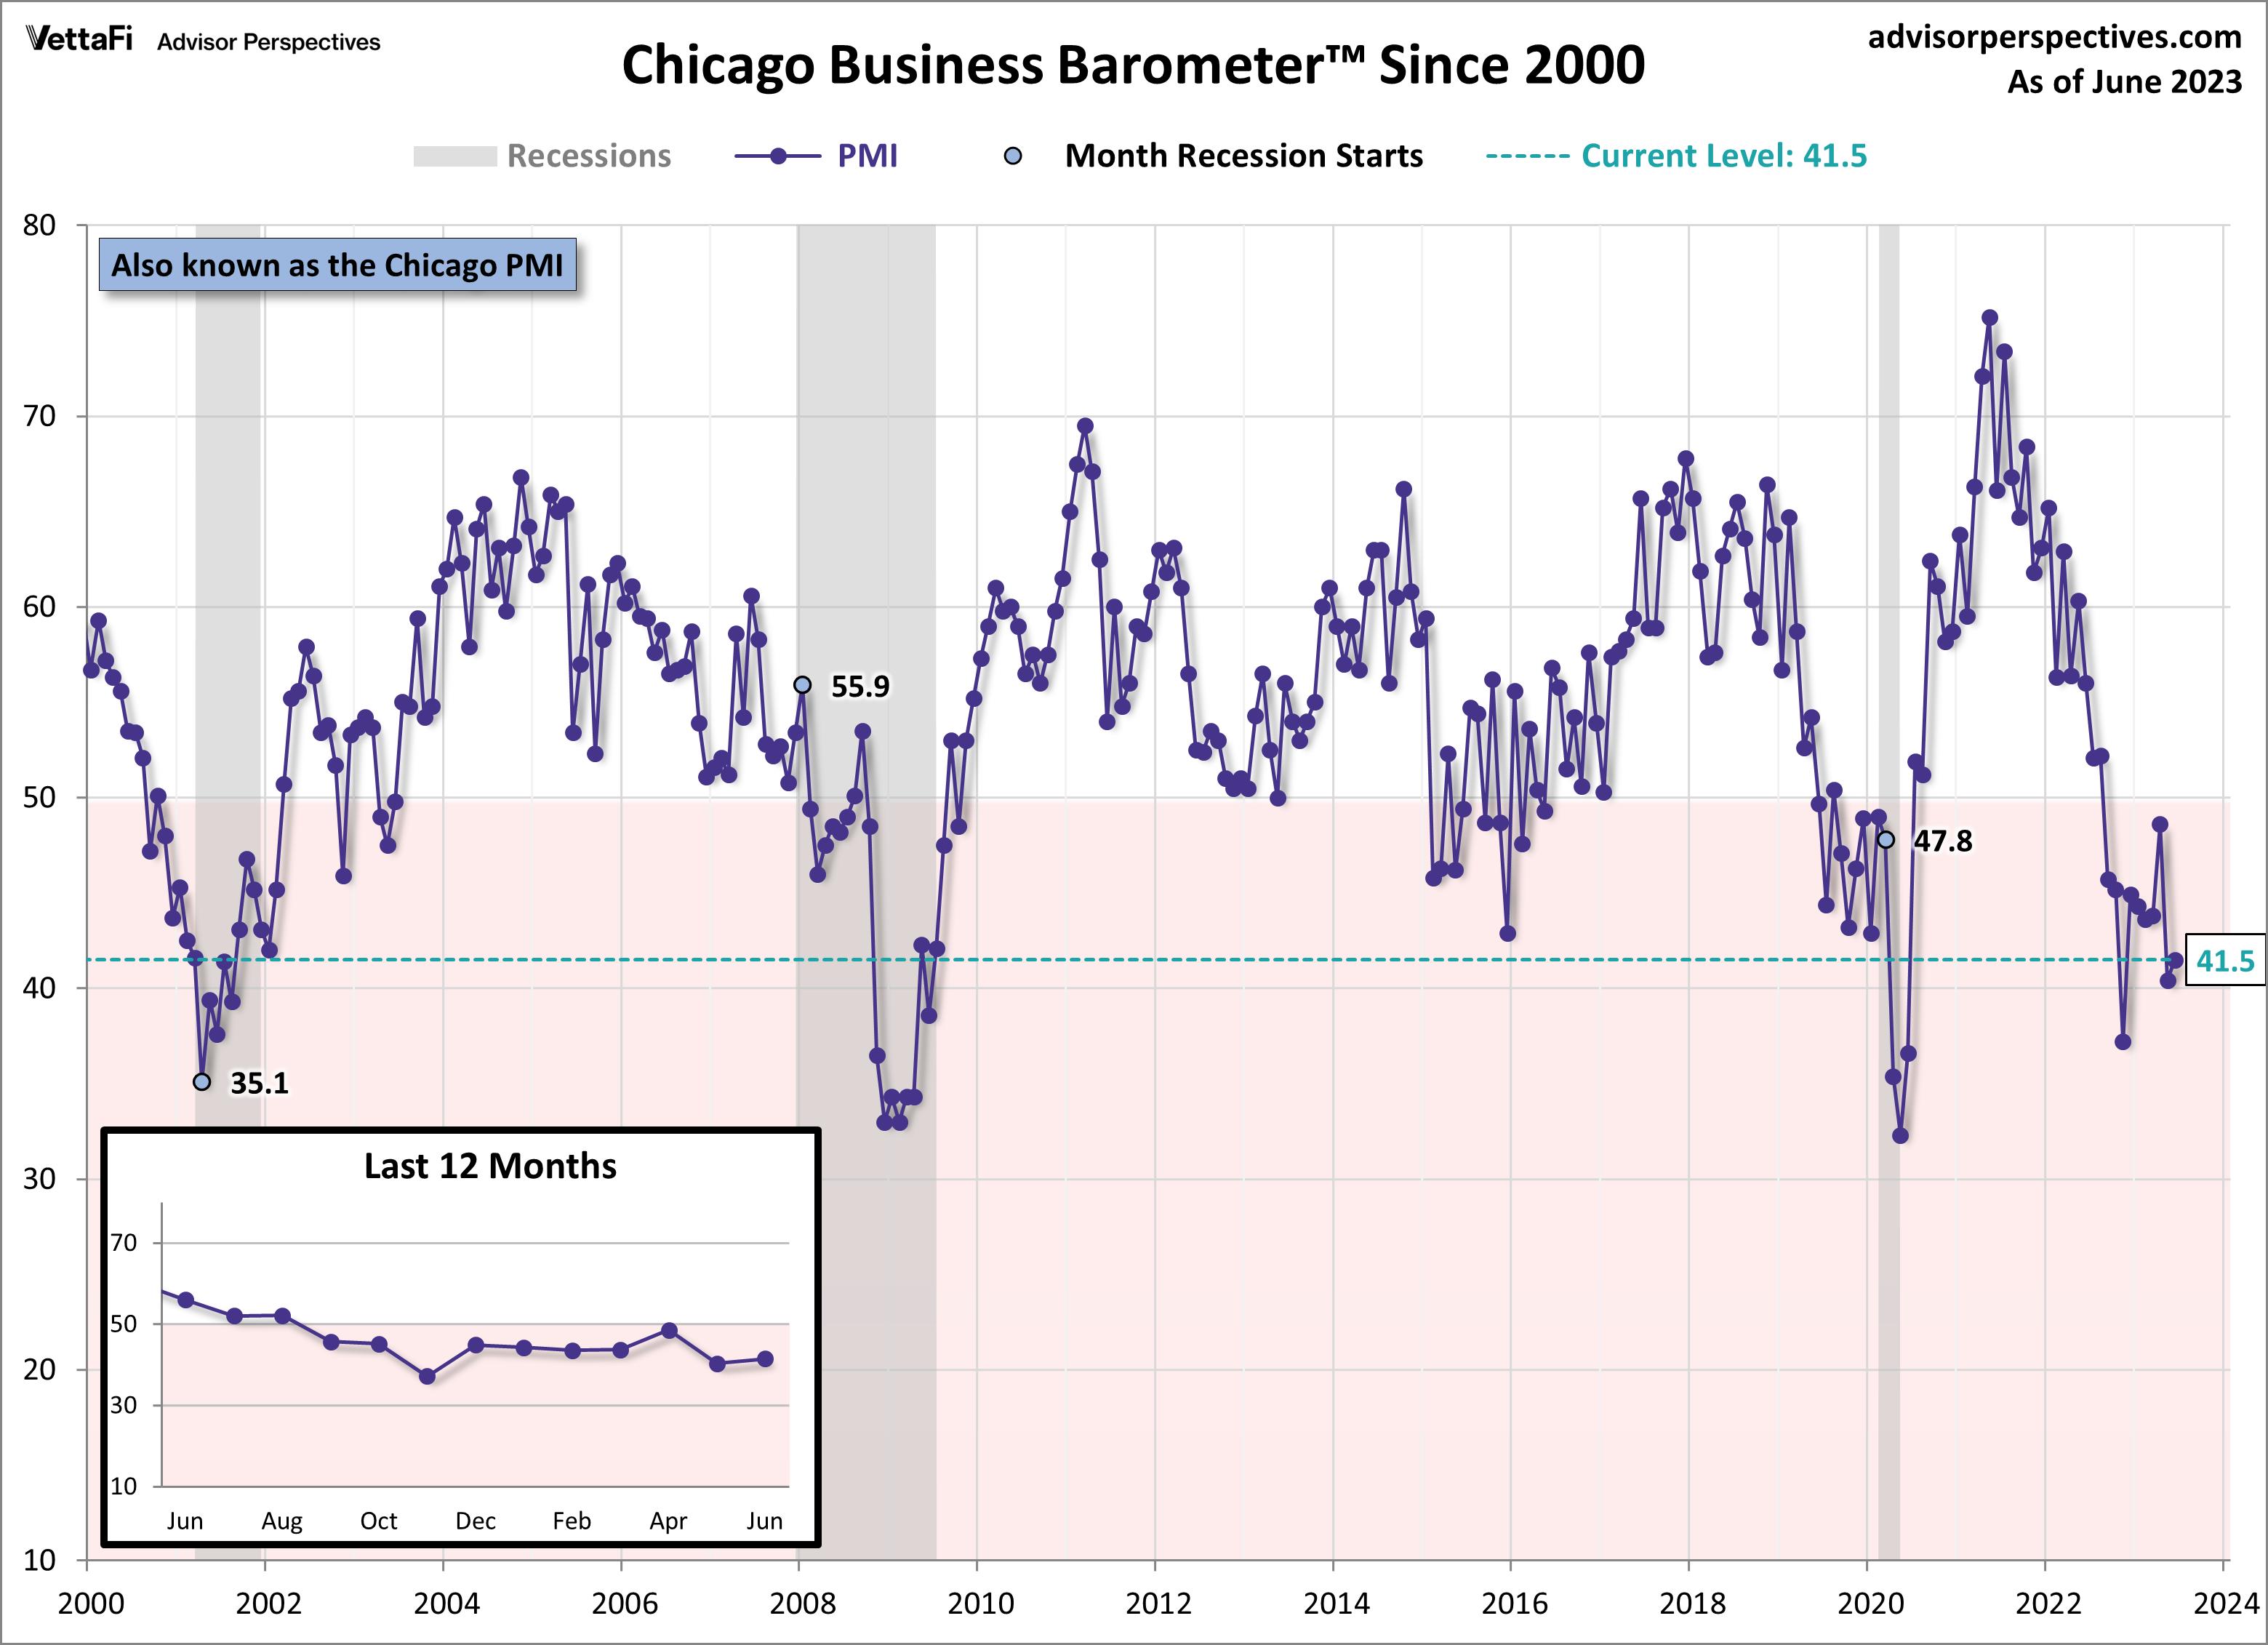 Chicago PMI since 2000